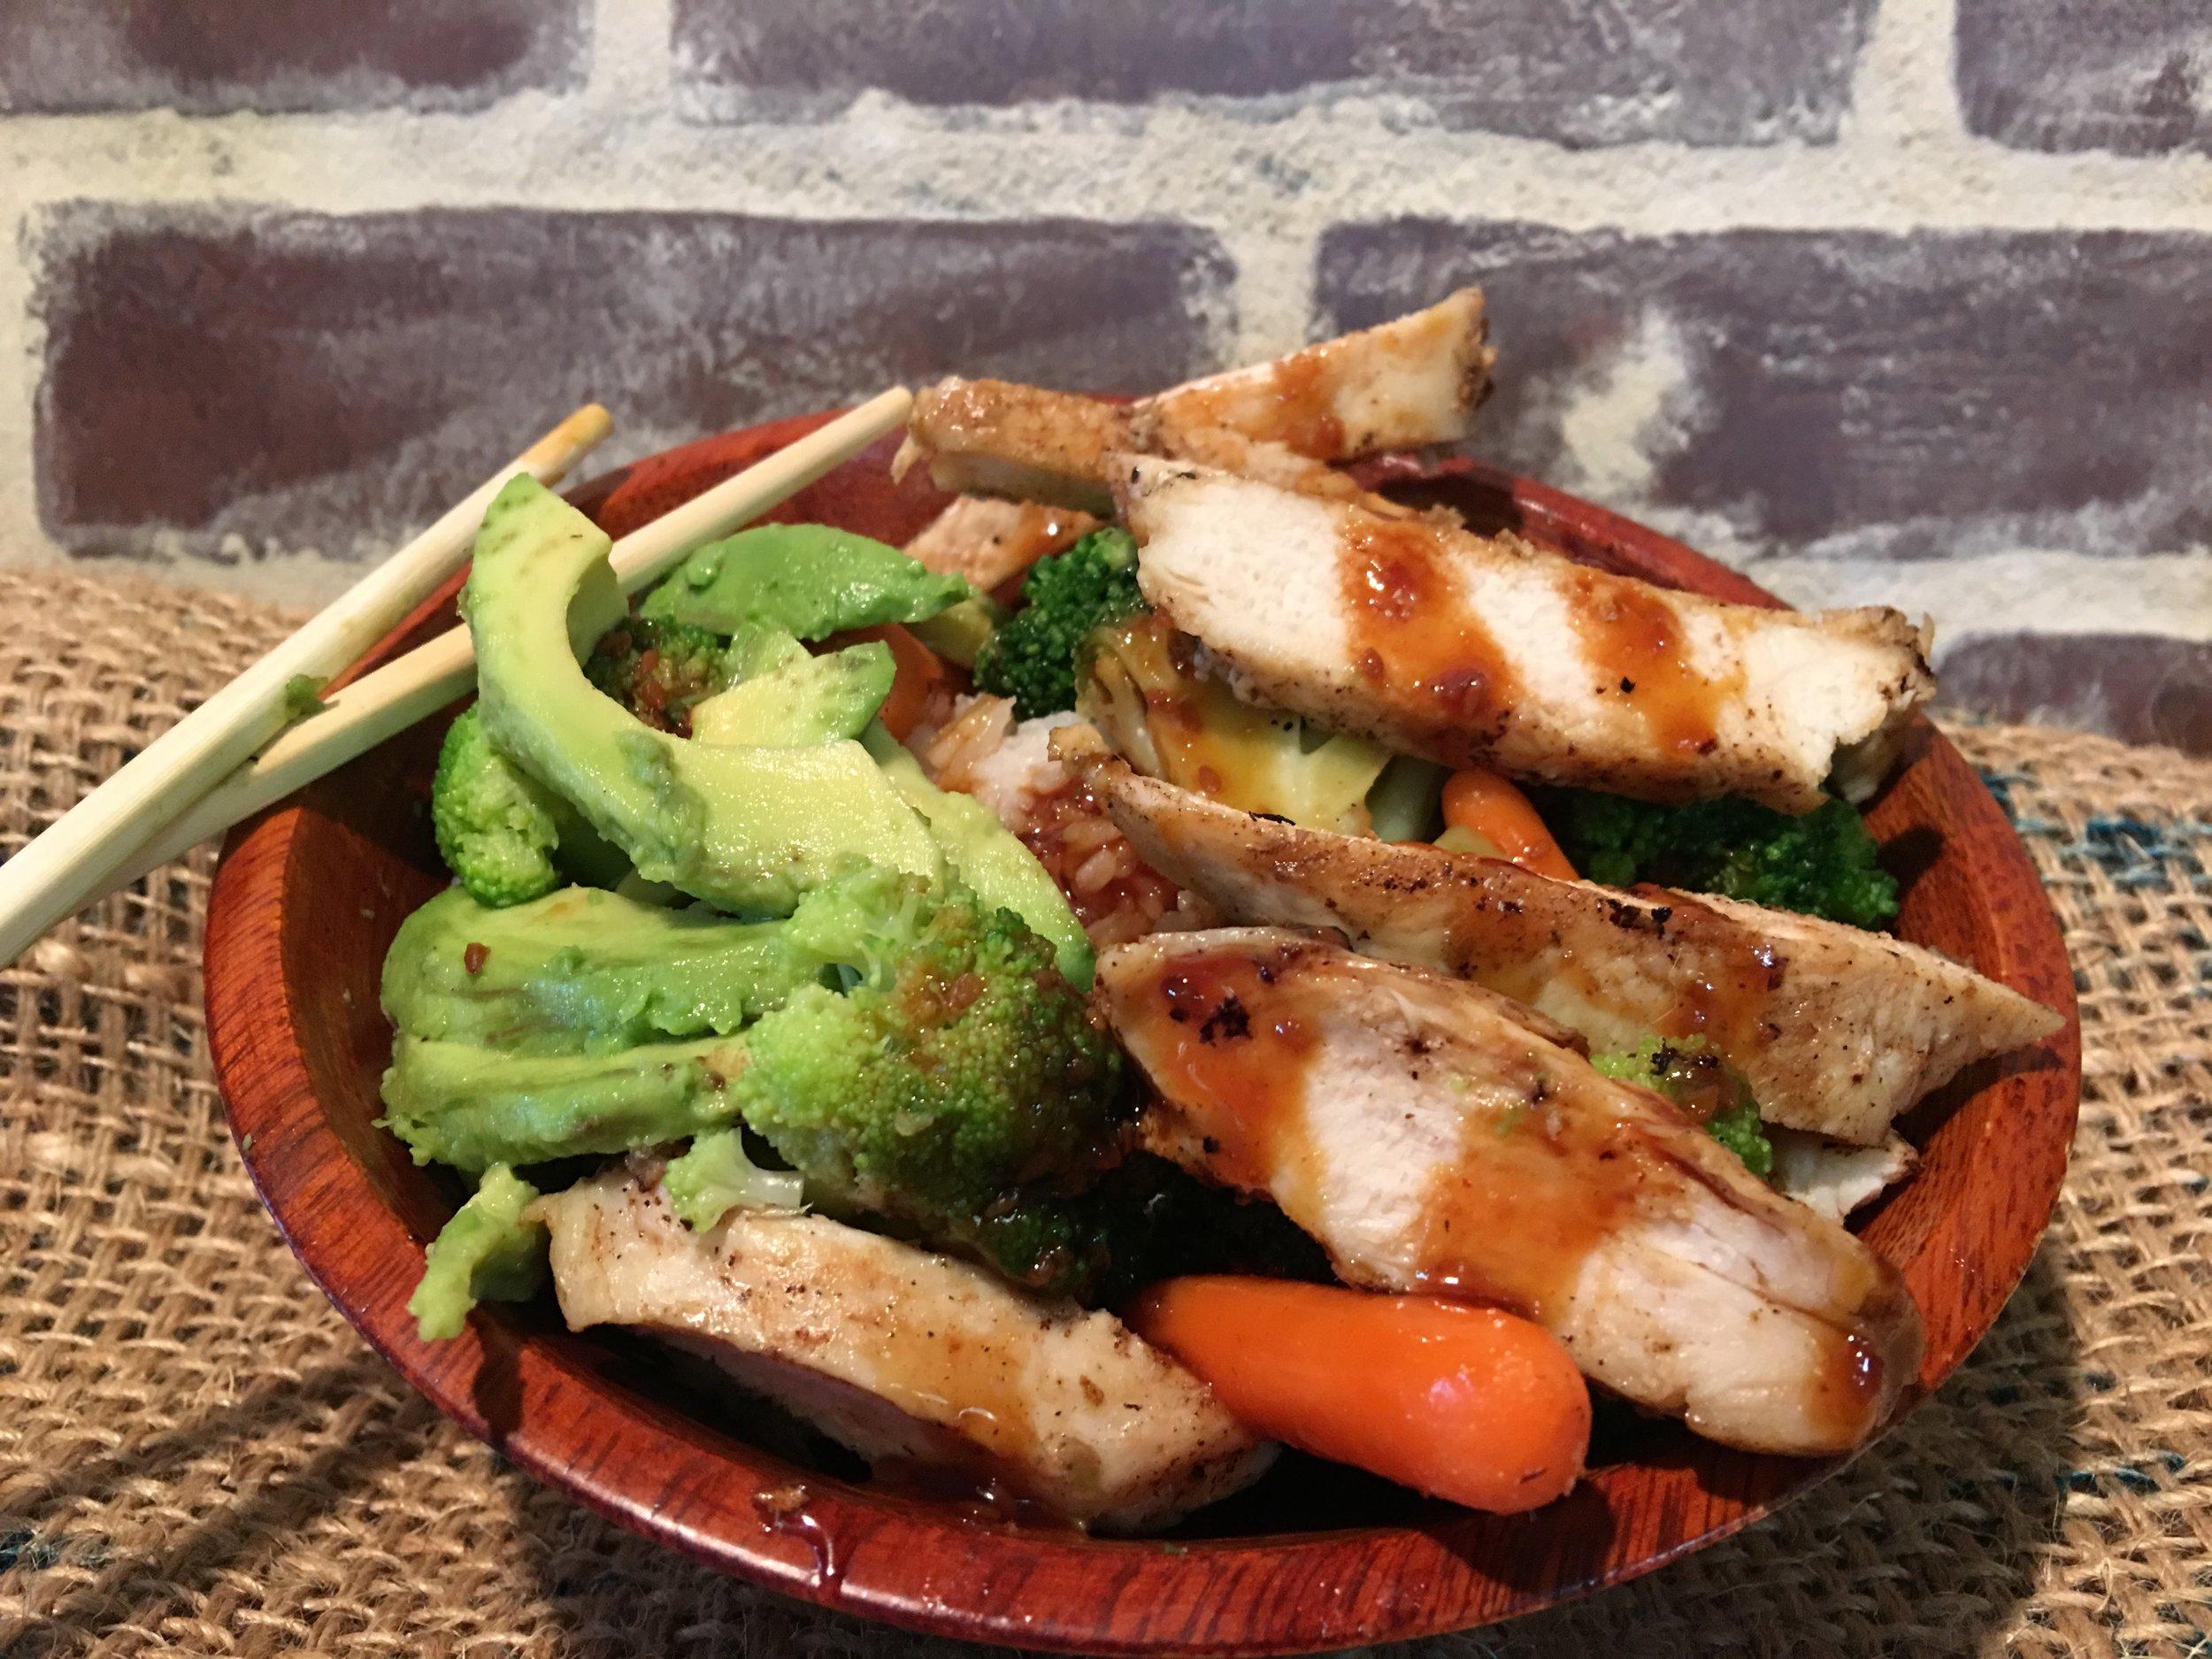 Teriyaki Bowl - Steamed White Rice, Broccoli, Carrots, Chicken Breast, Avocado, with Teriyaki Sauce7.90